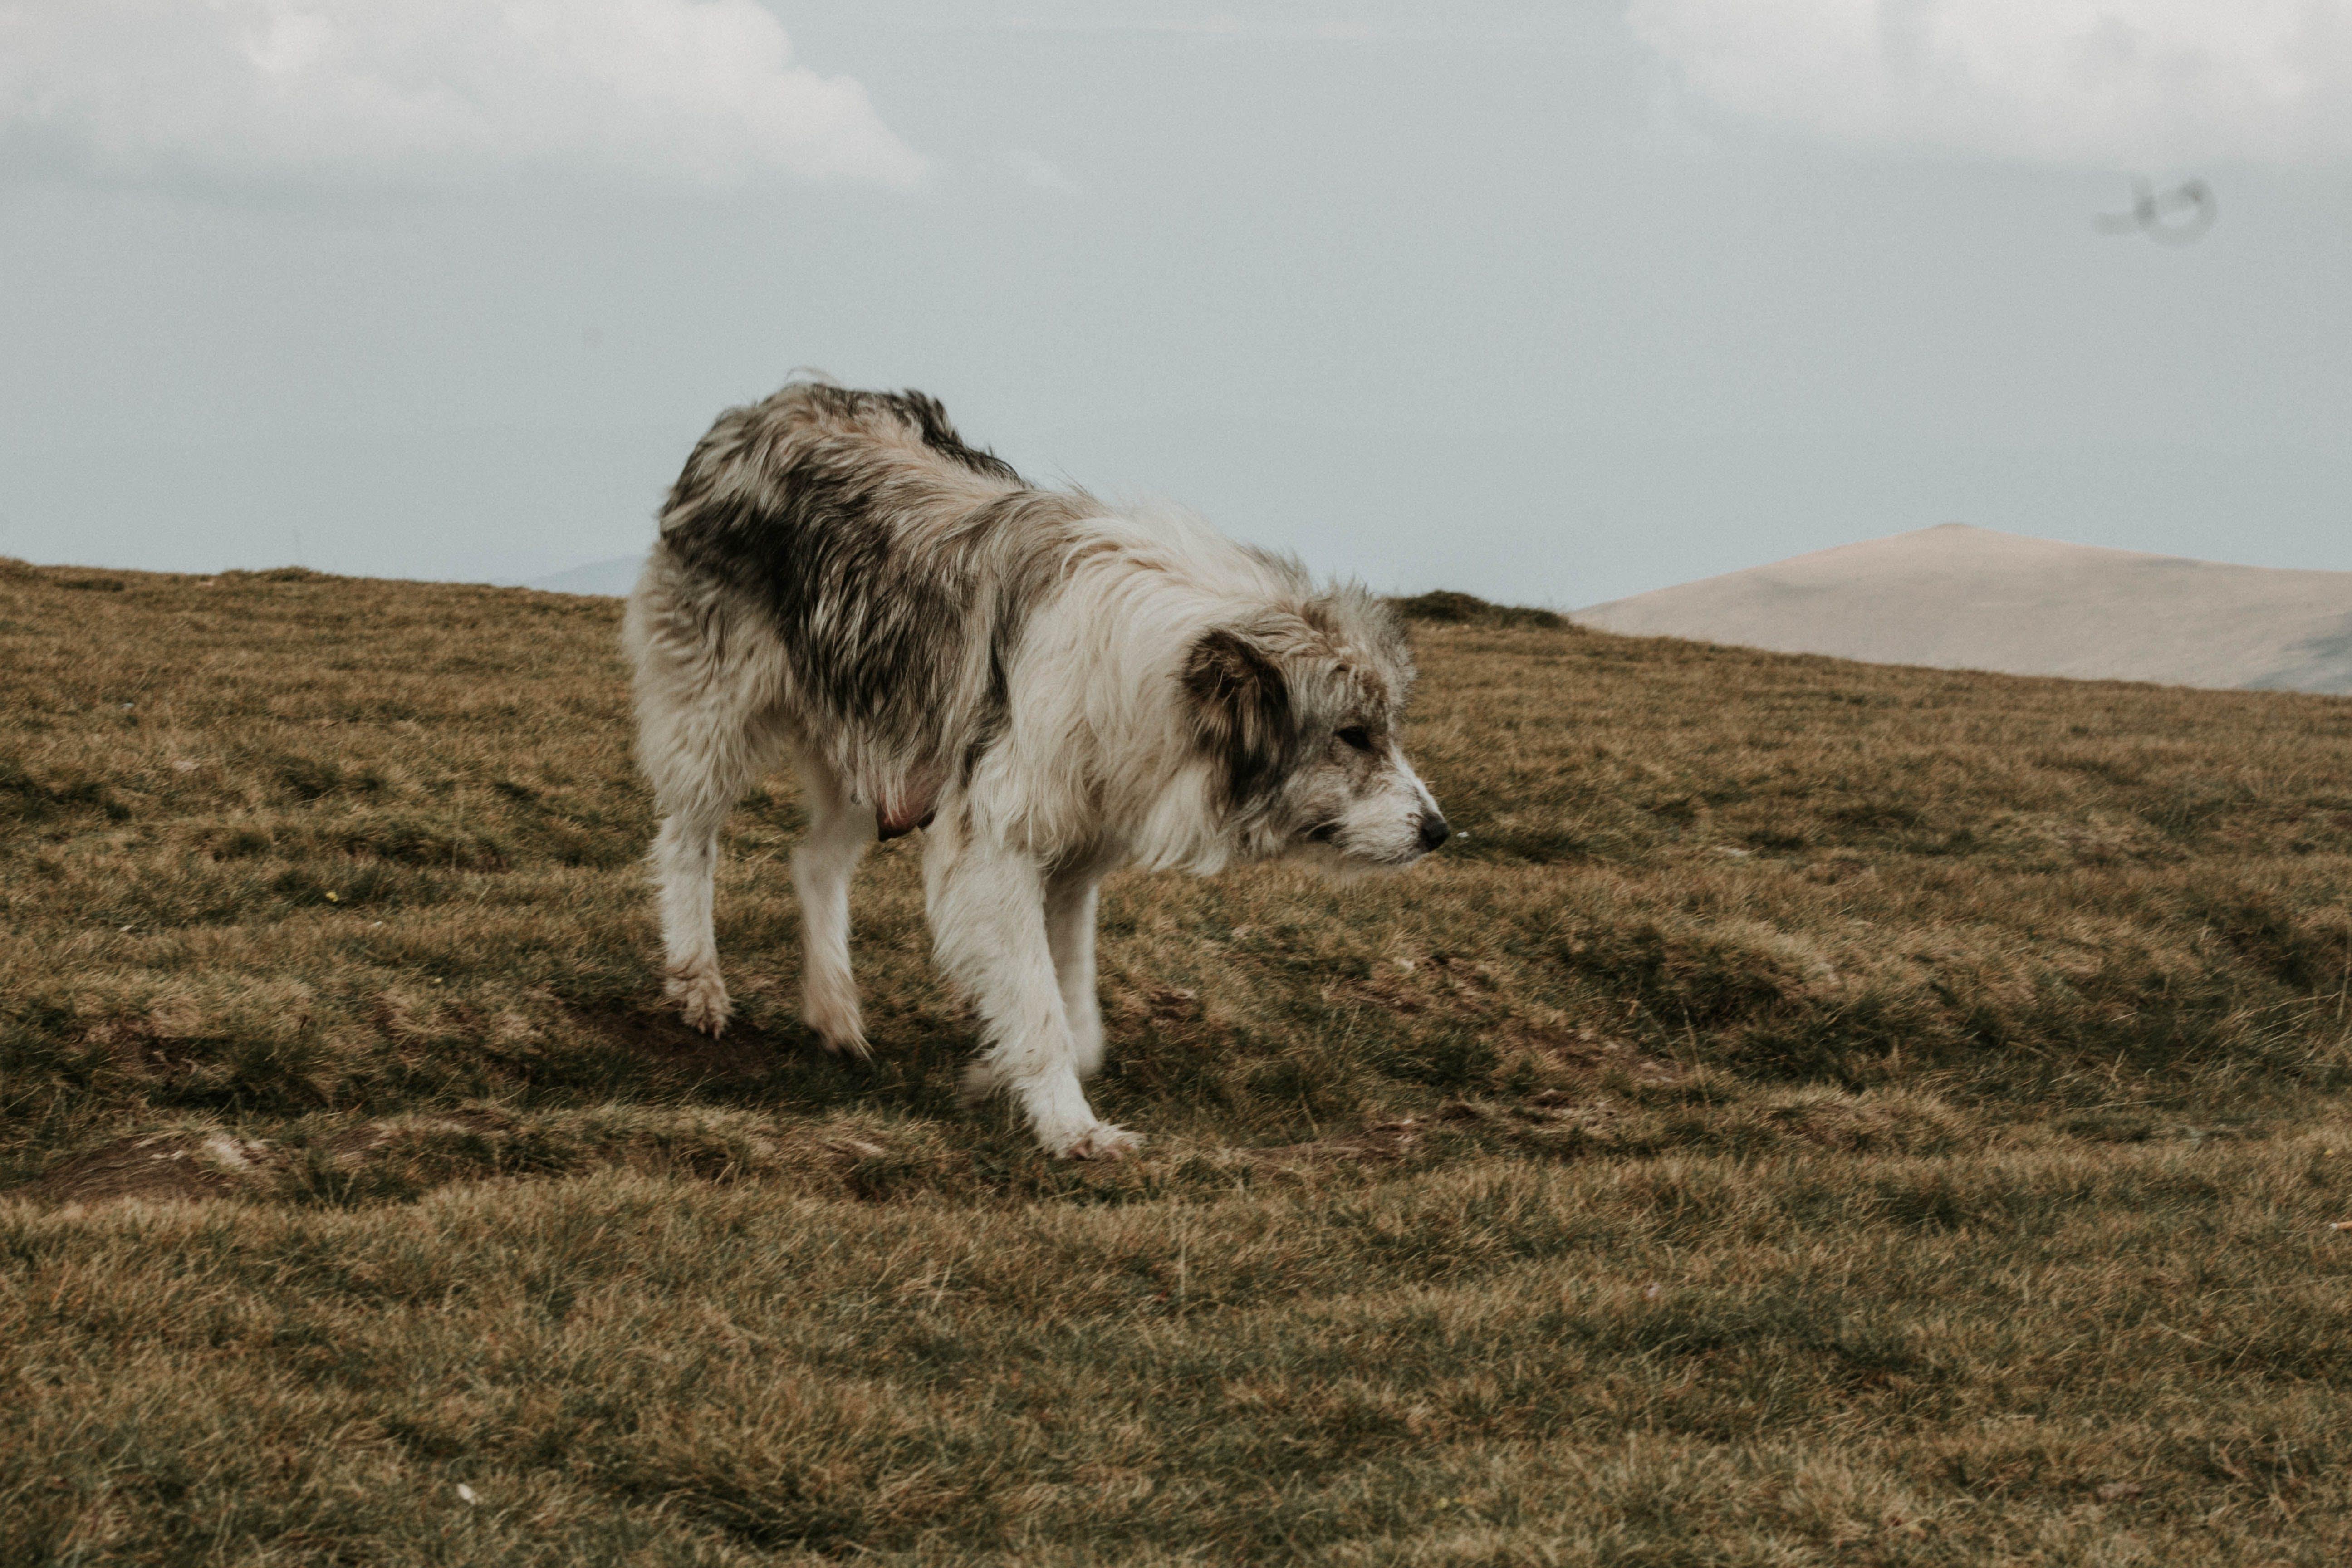 Medium Short-coated Gray and White Dog on Green Grass Under Gray Sky